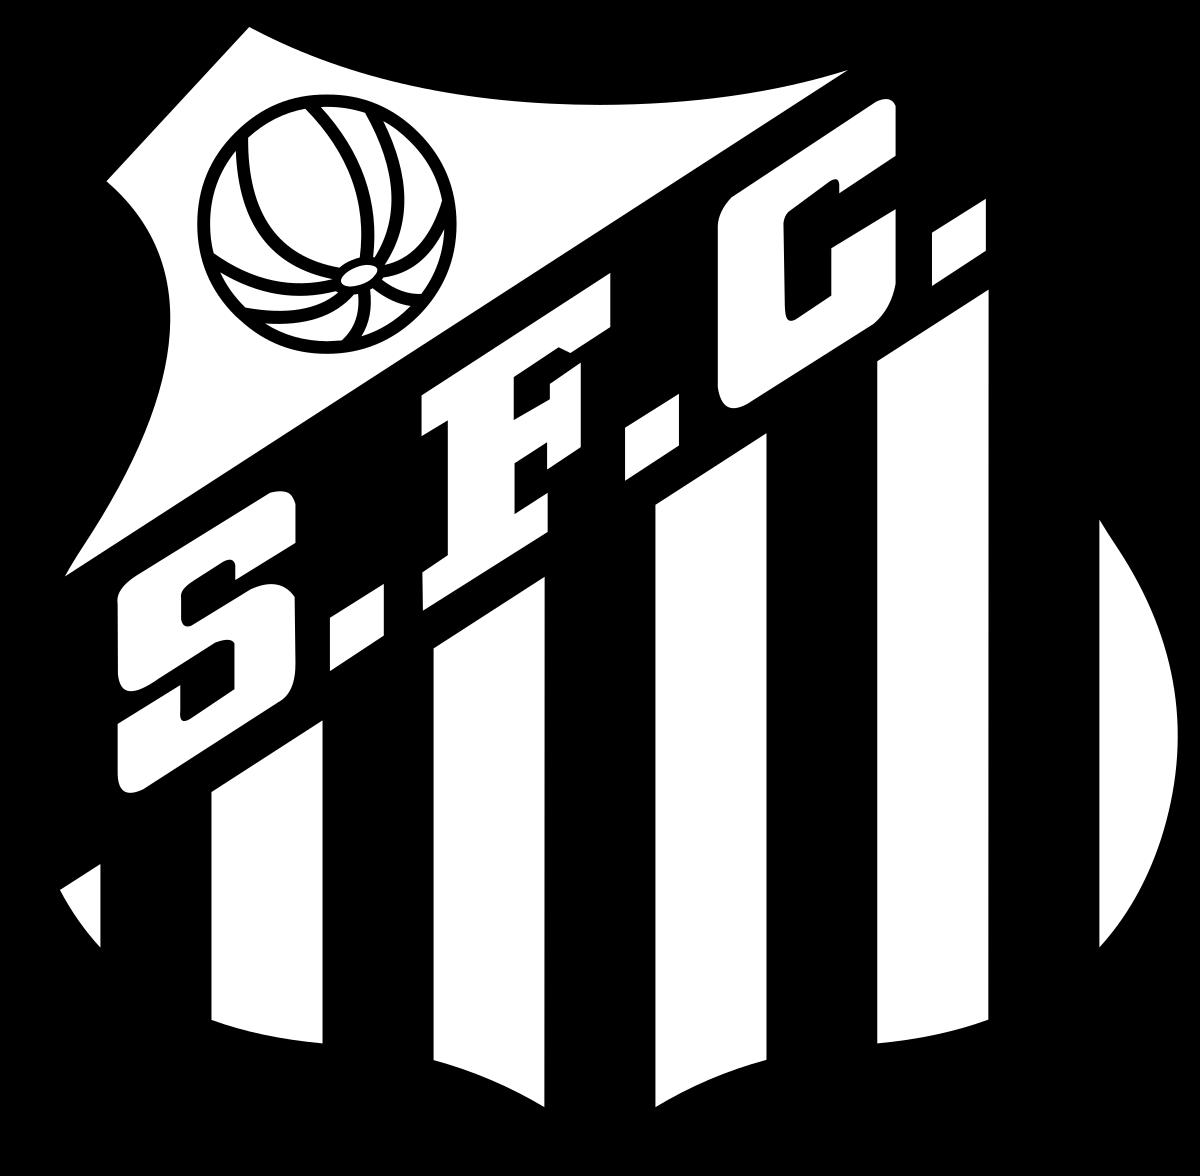 Santos fc wikipedia . Goal clipart football tournament